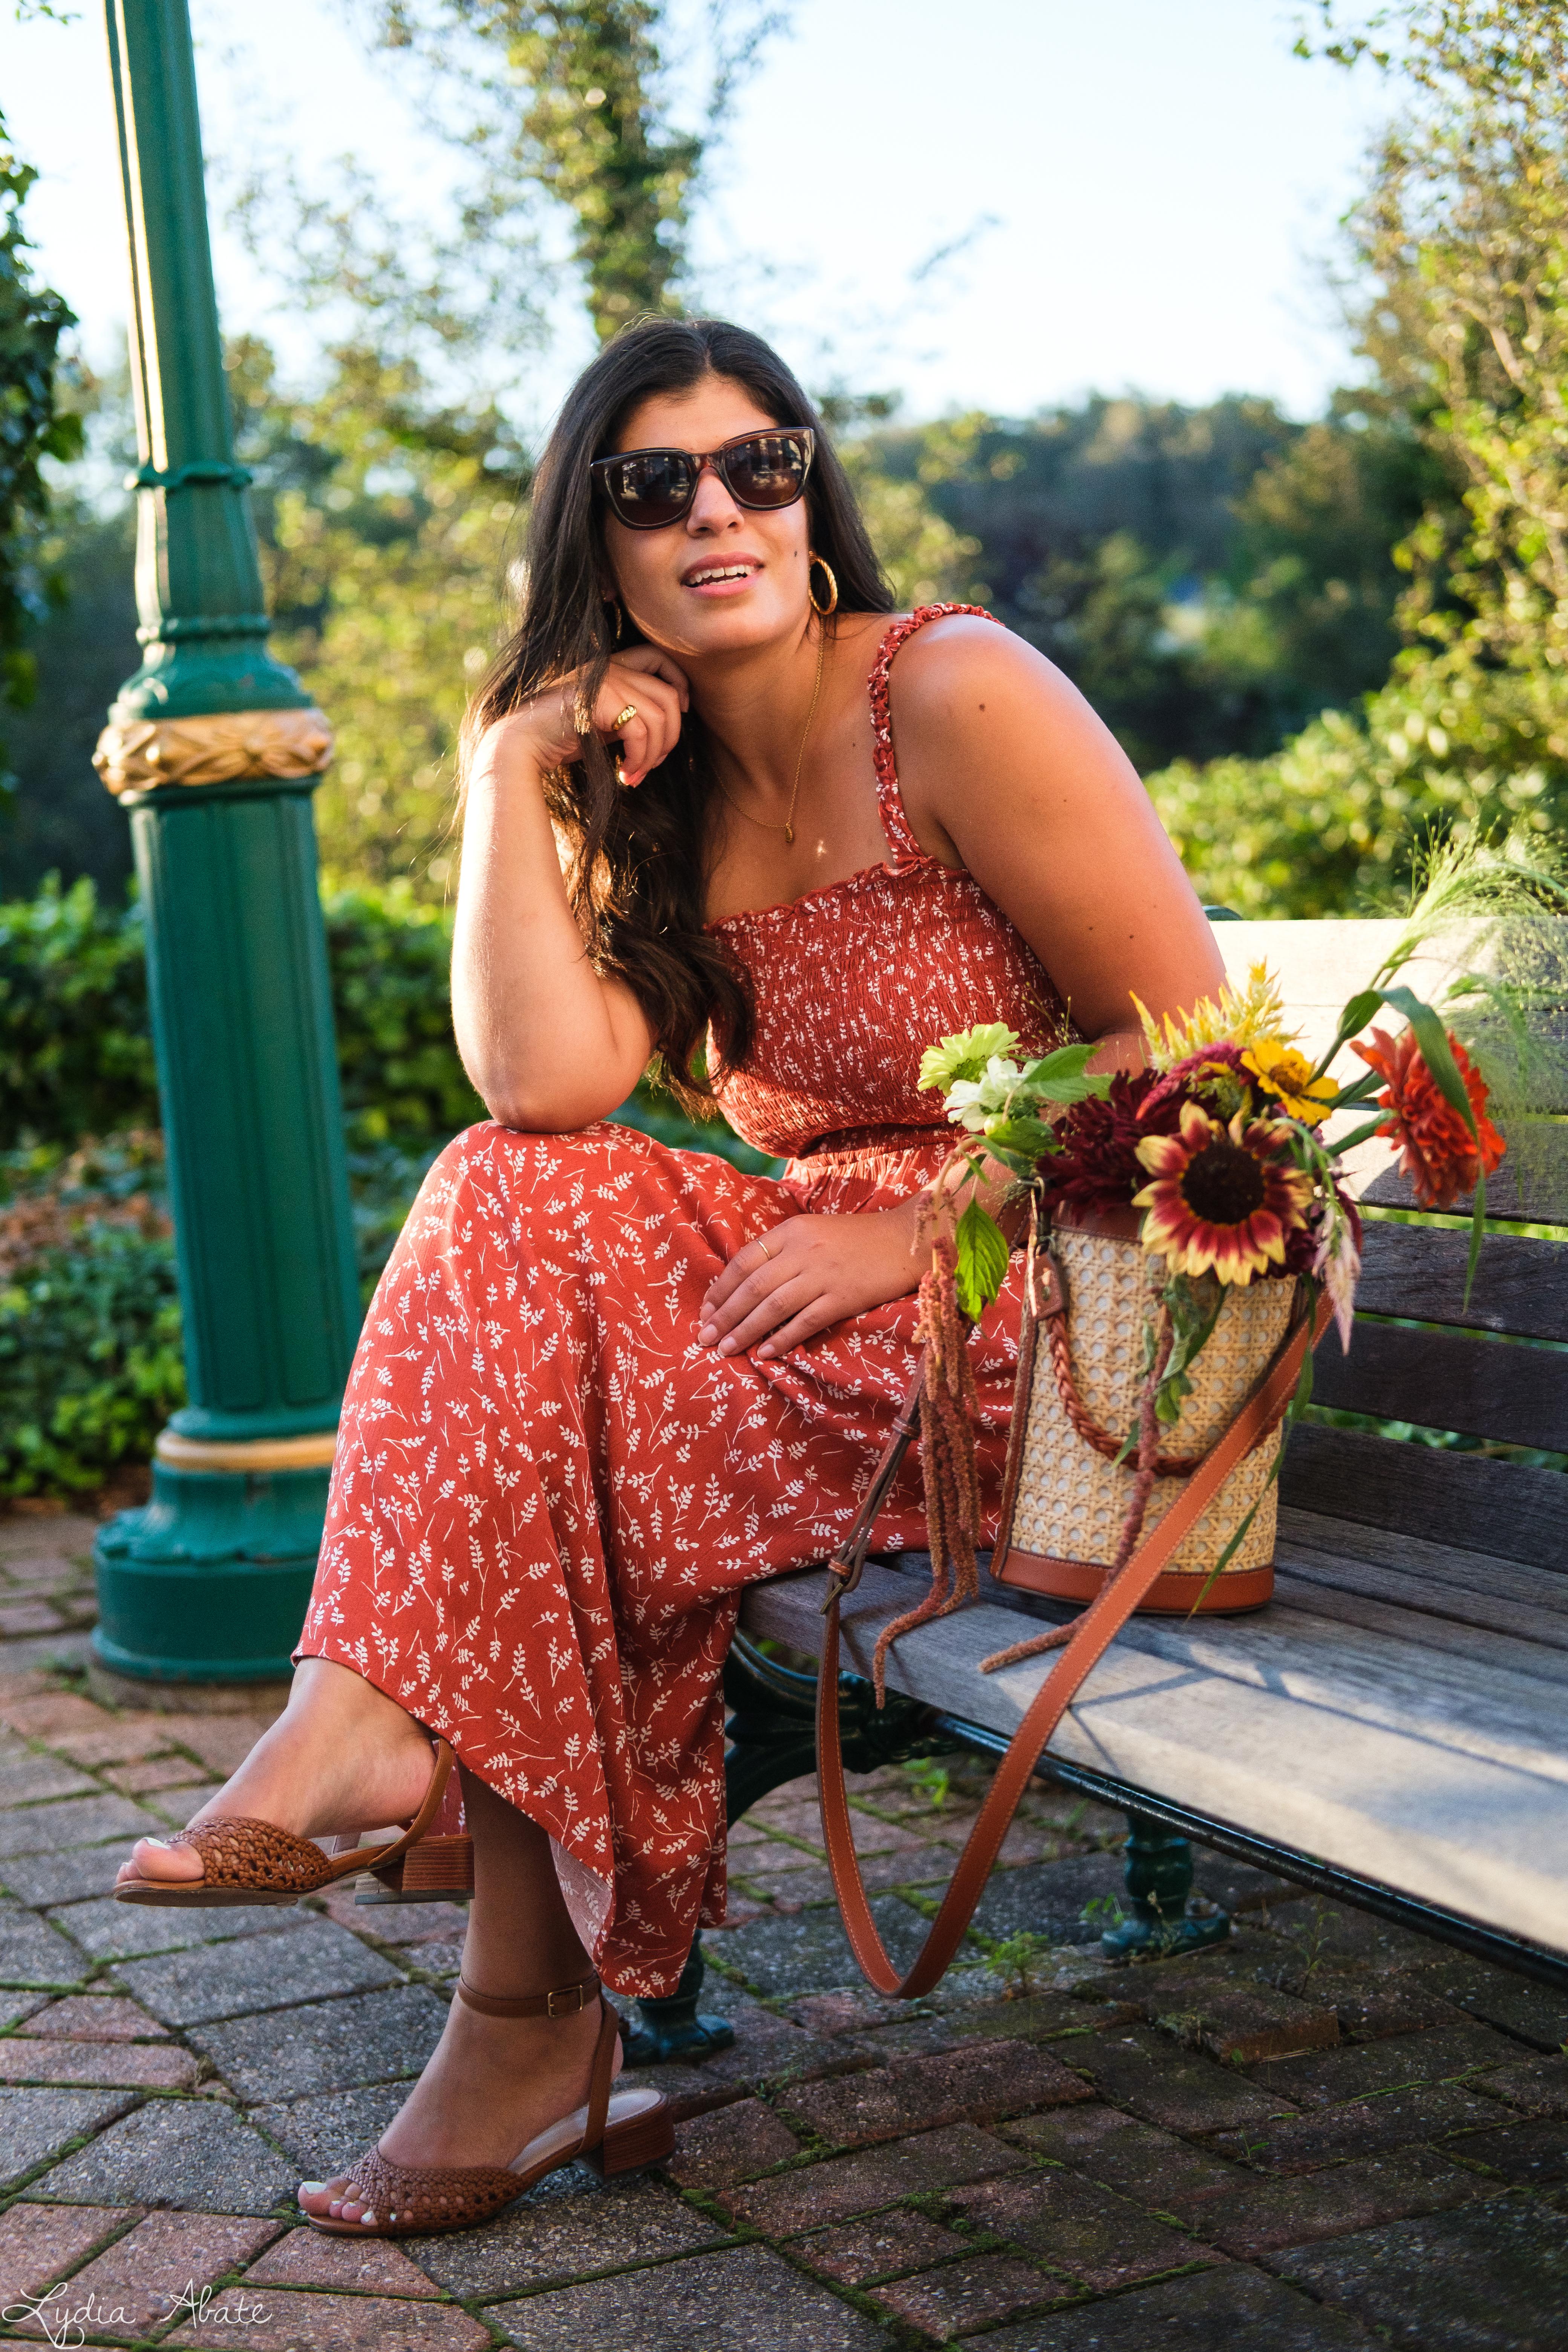 shirred rust floral maxi dress, caned bucket bag, brown sandals-2.jpg